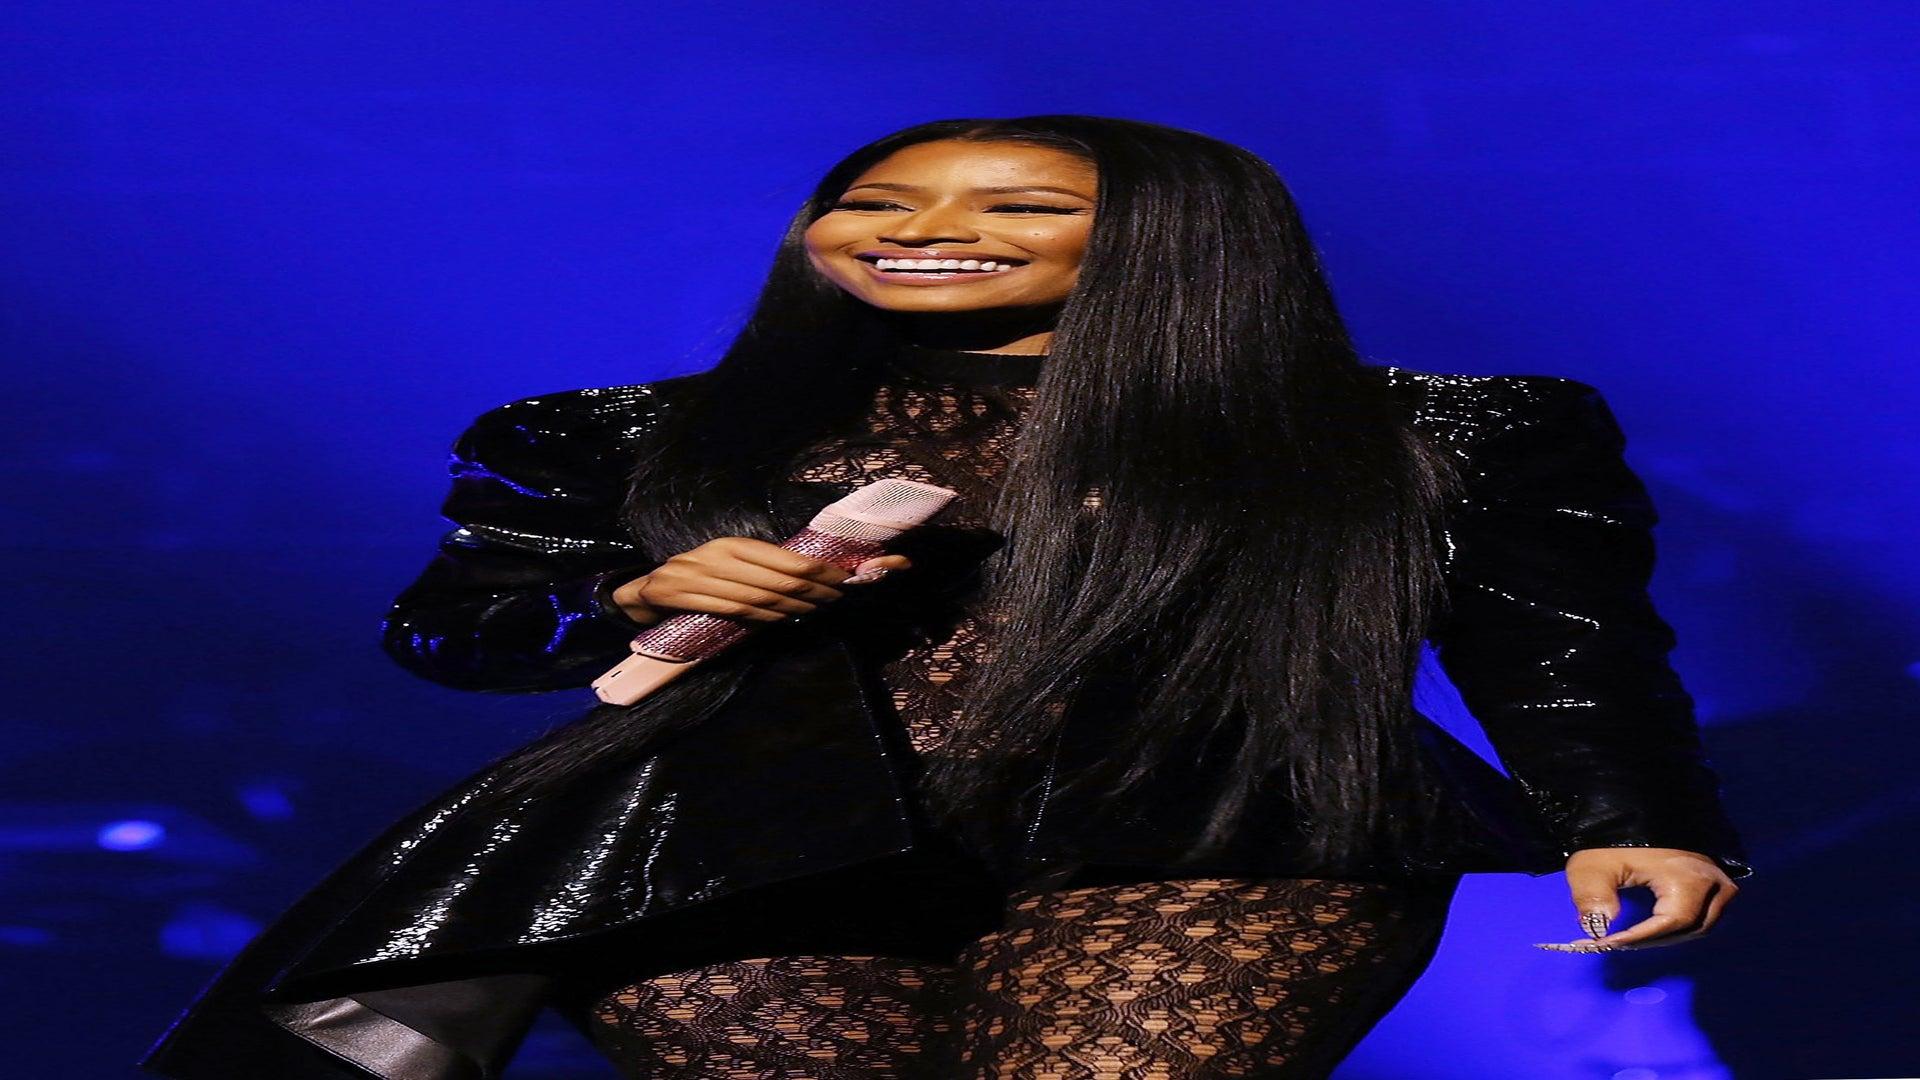 Nicki Minaj Praises Hillary Clinton And Shuts Down Melania Trump During TIDAL Performance